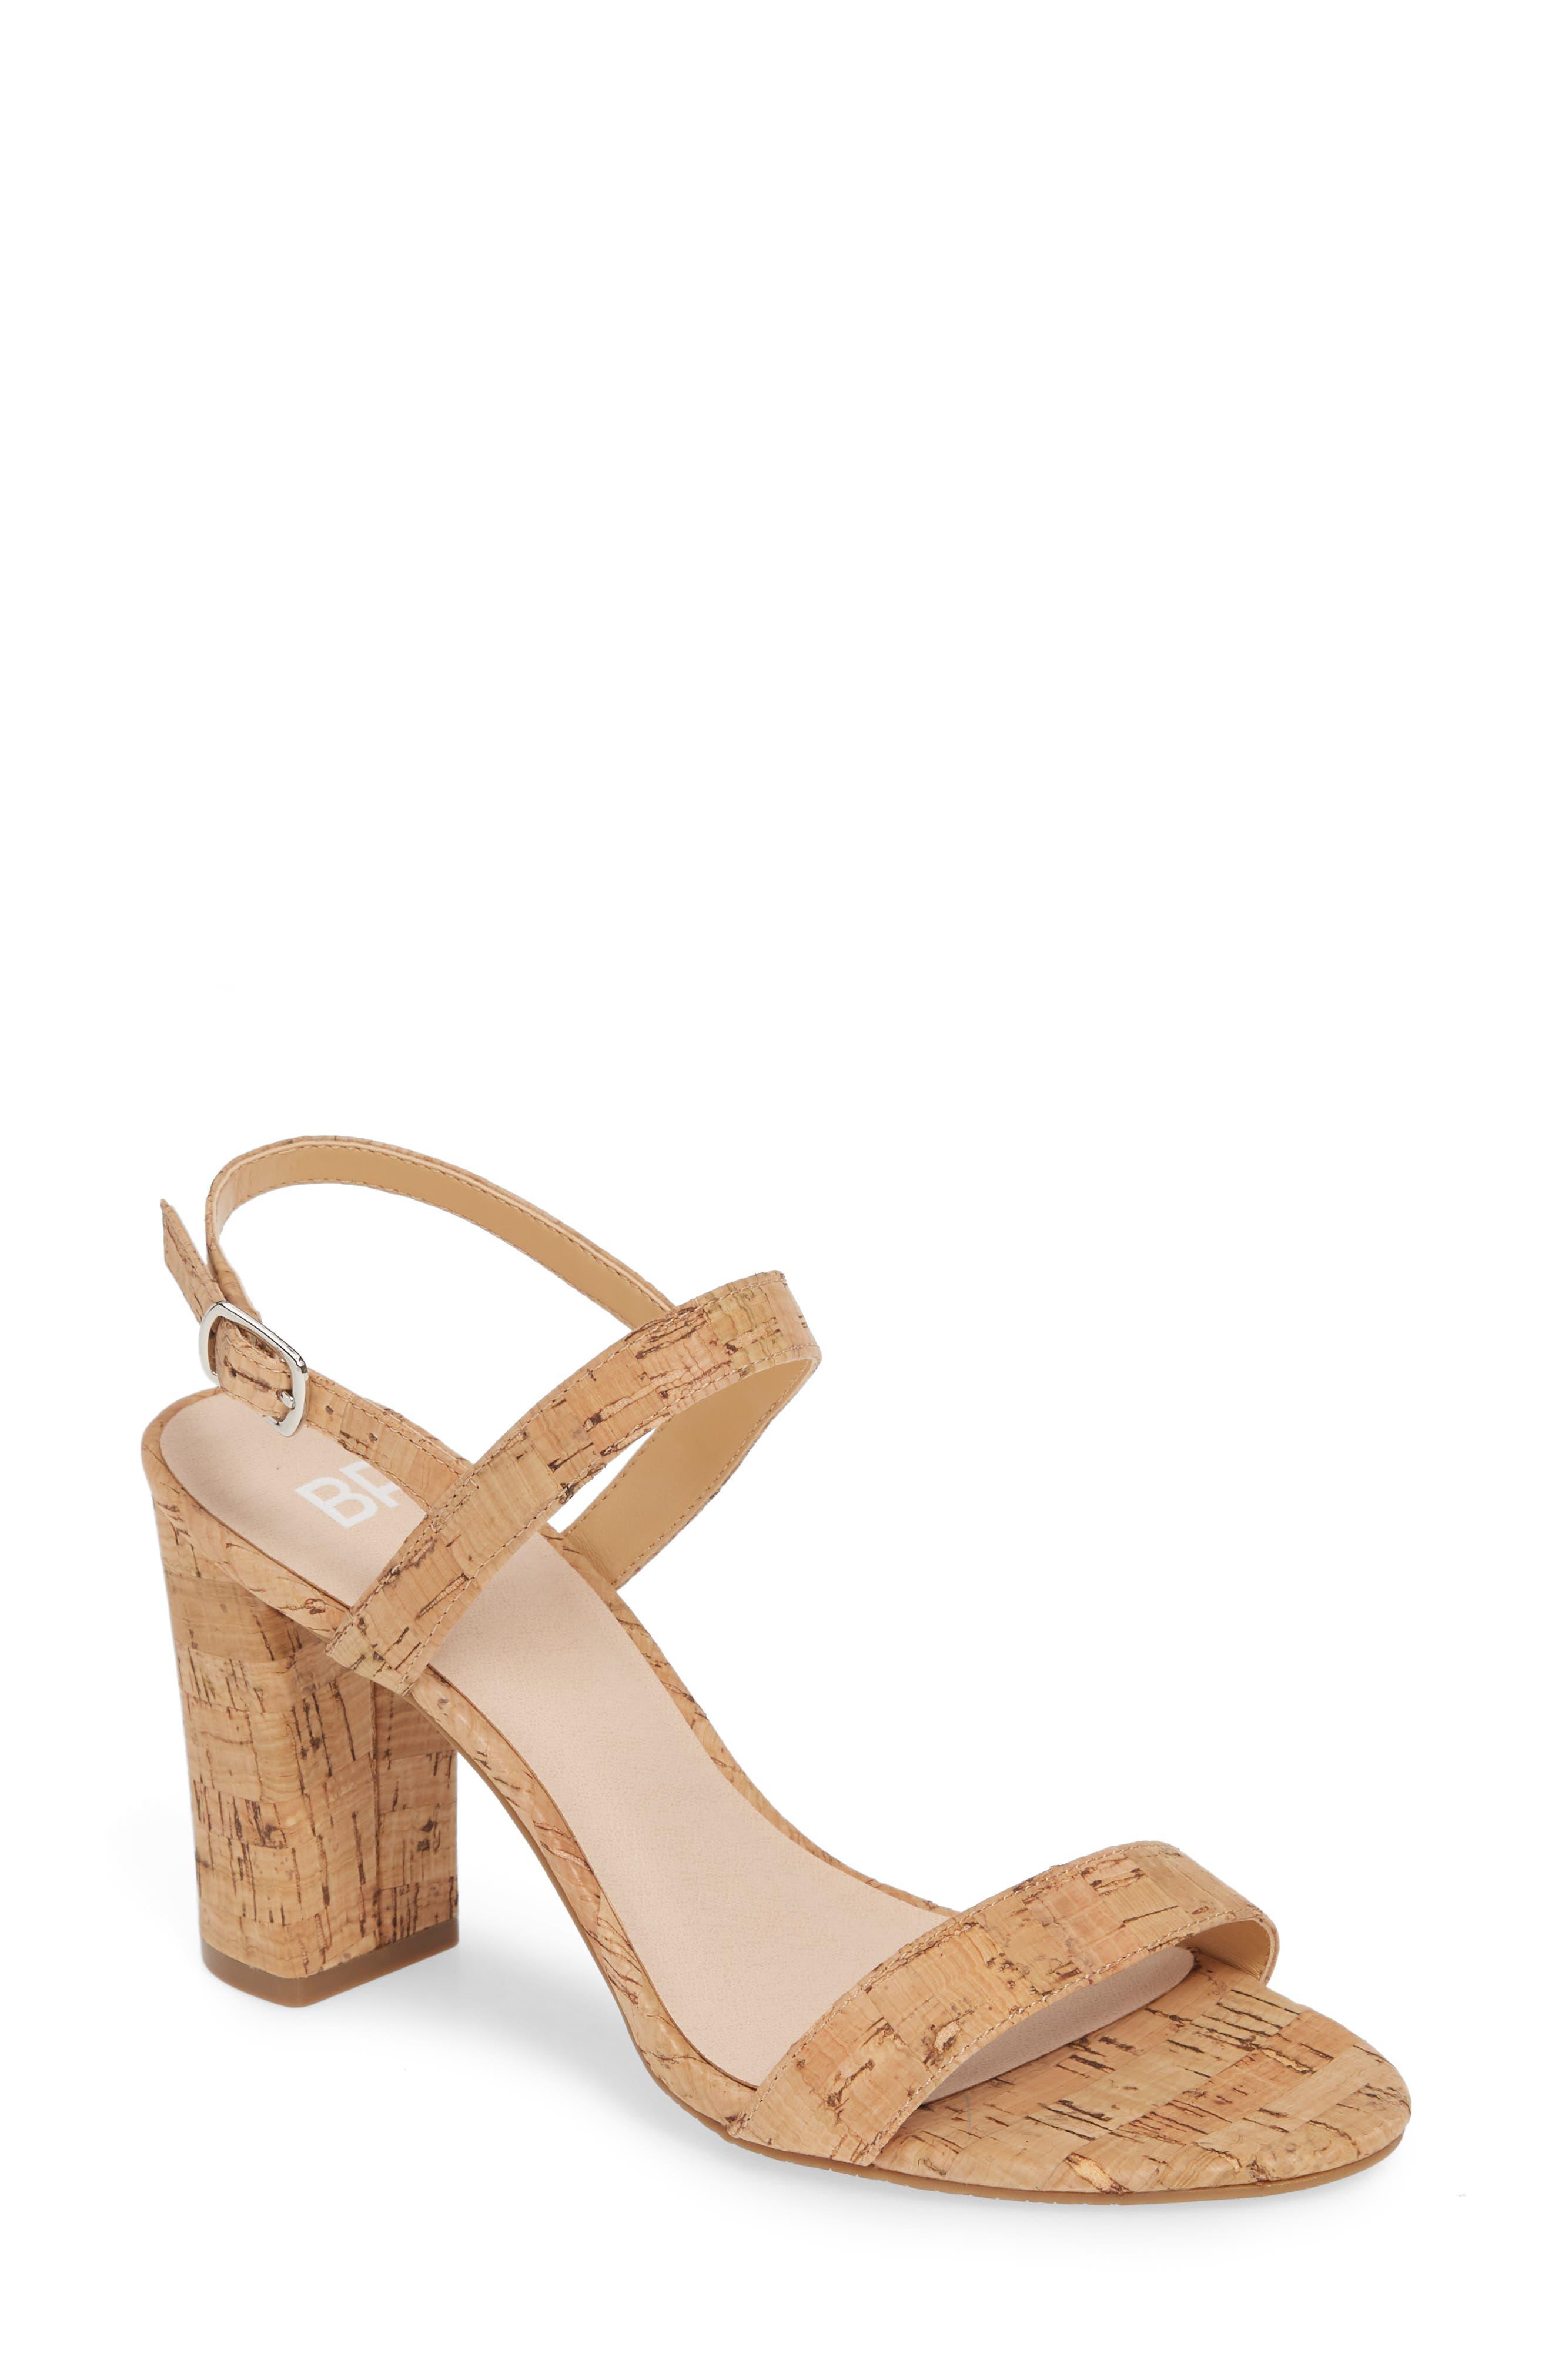 BP. | Lula Block Heel Slingback Sandal